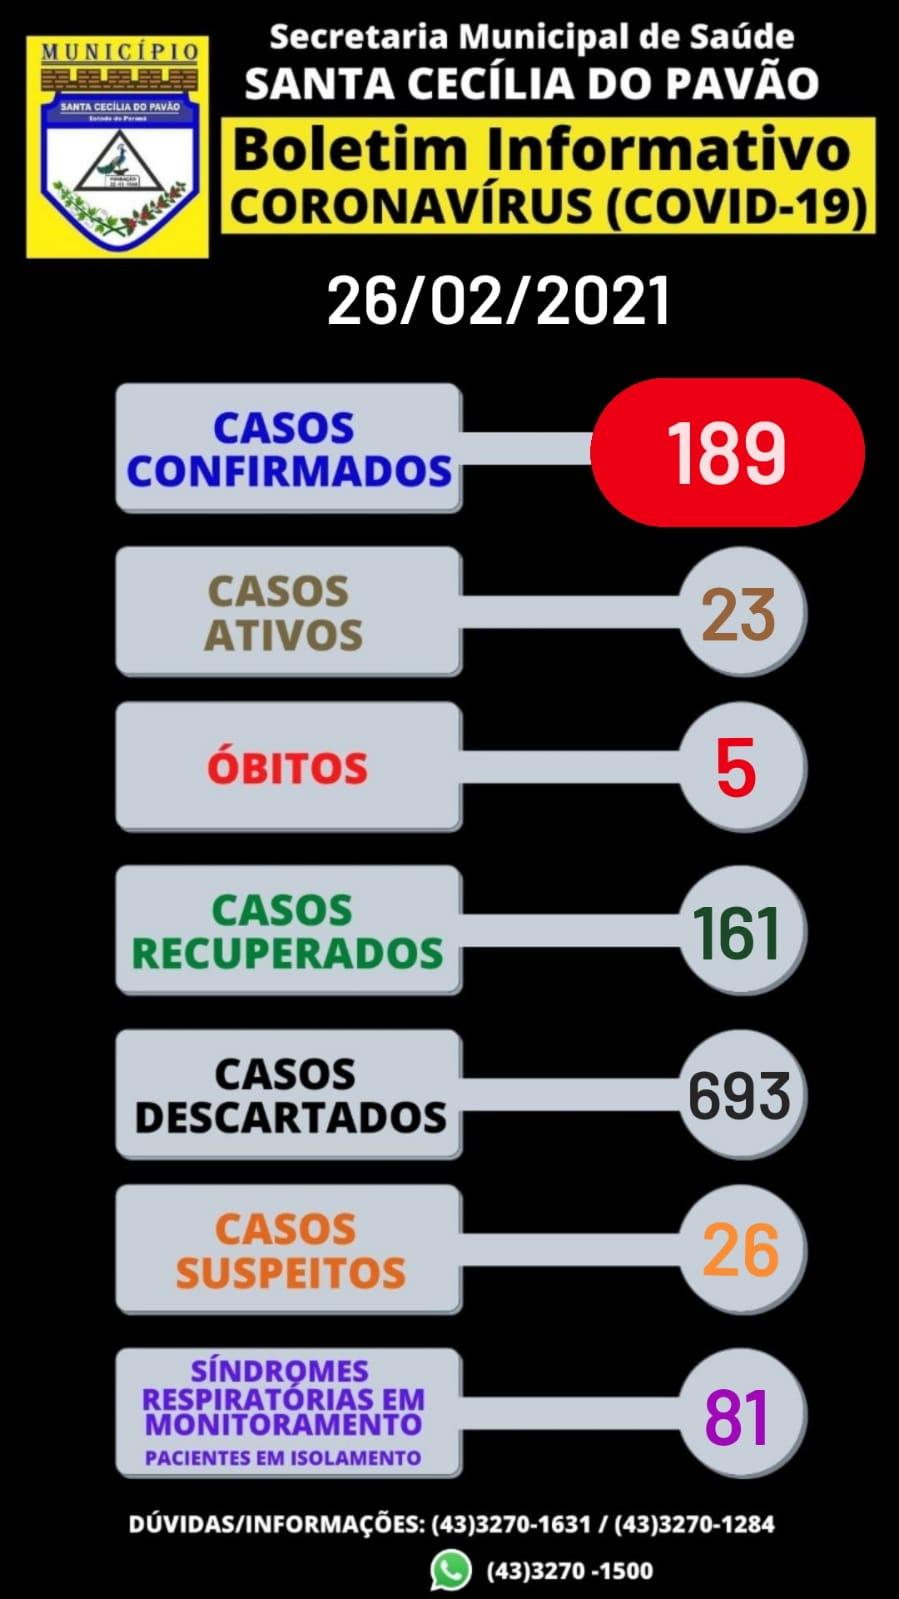 BOLETIM INFORMATIVO  CORONAVÍRUS (COVID 19) - 26/02/2021